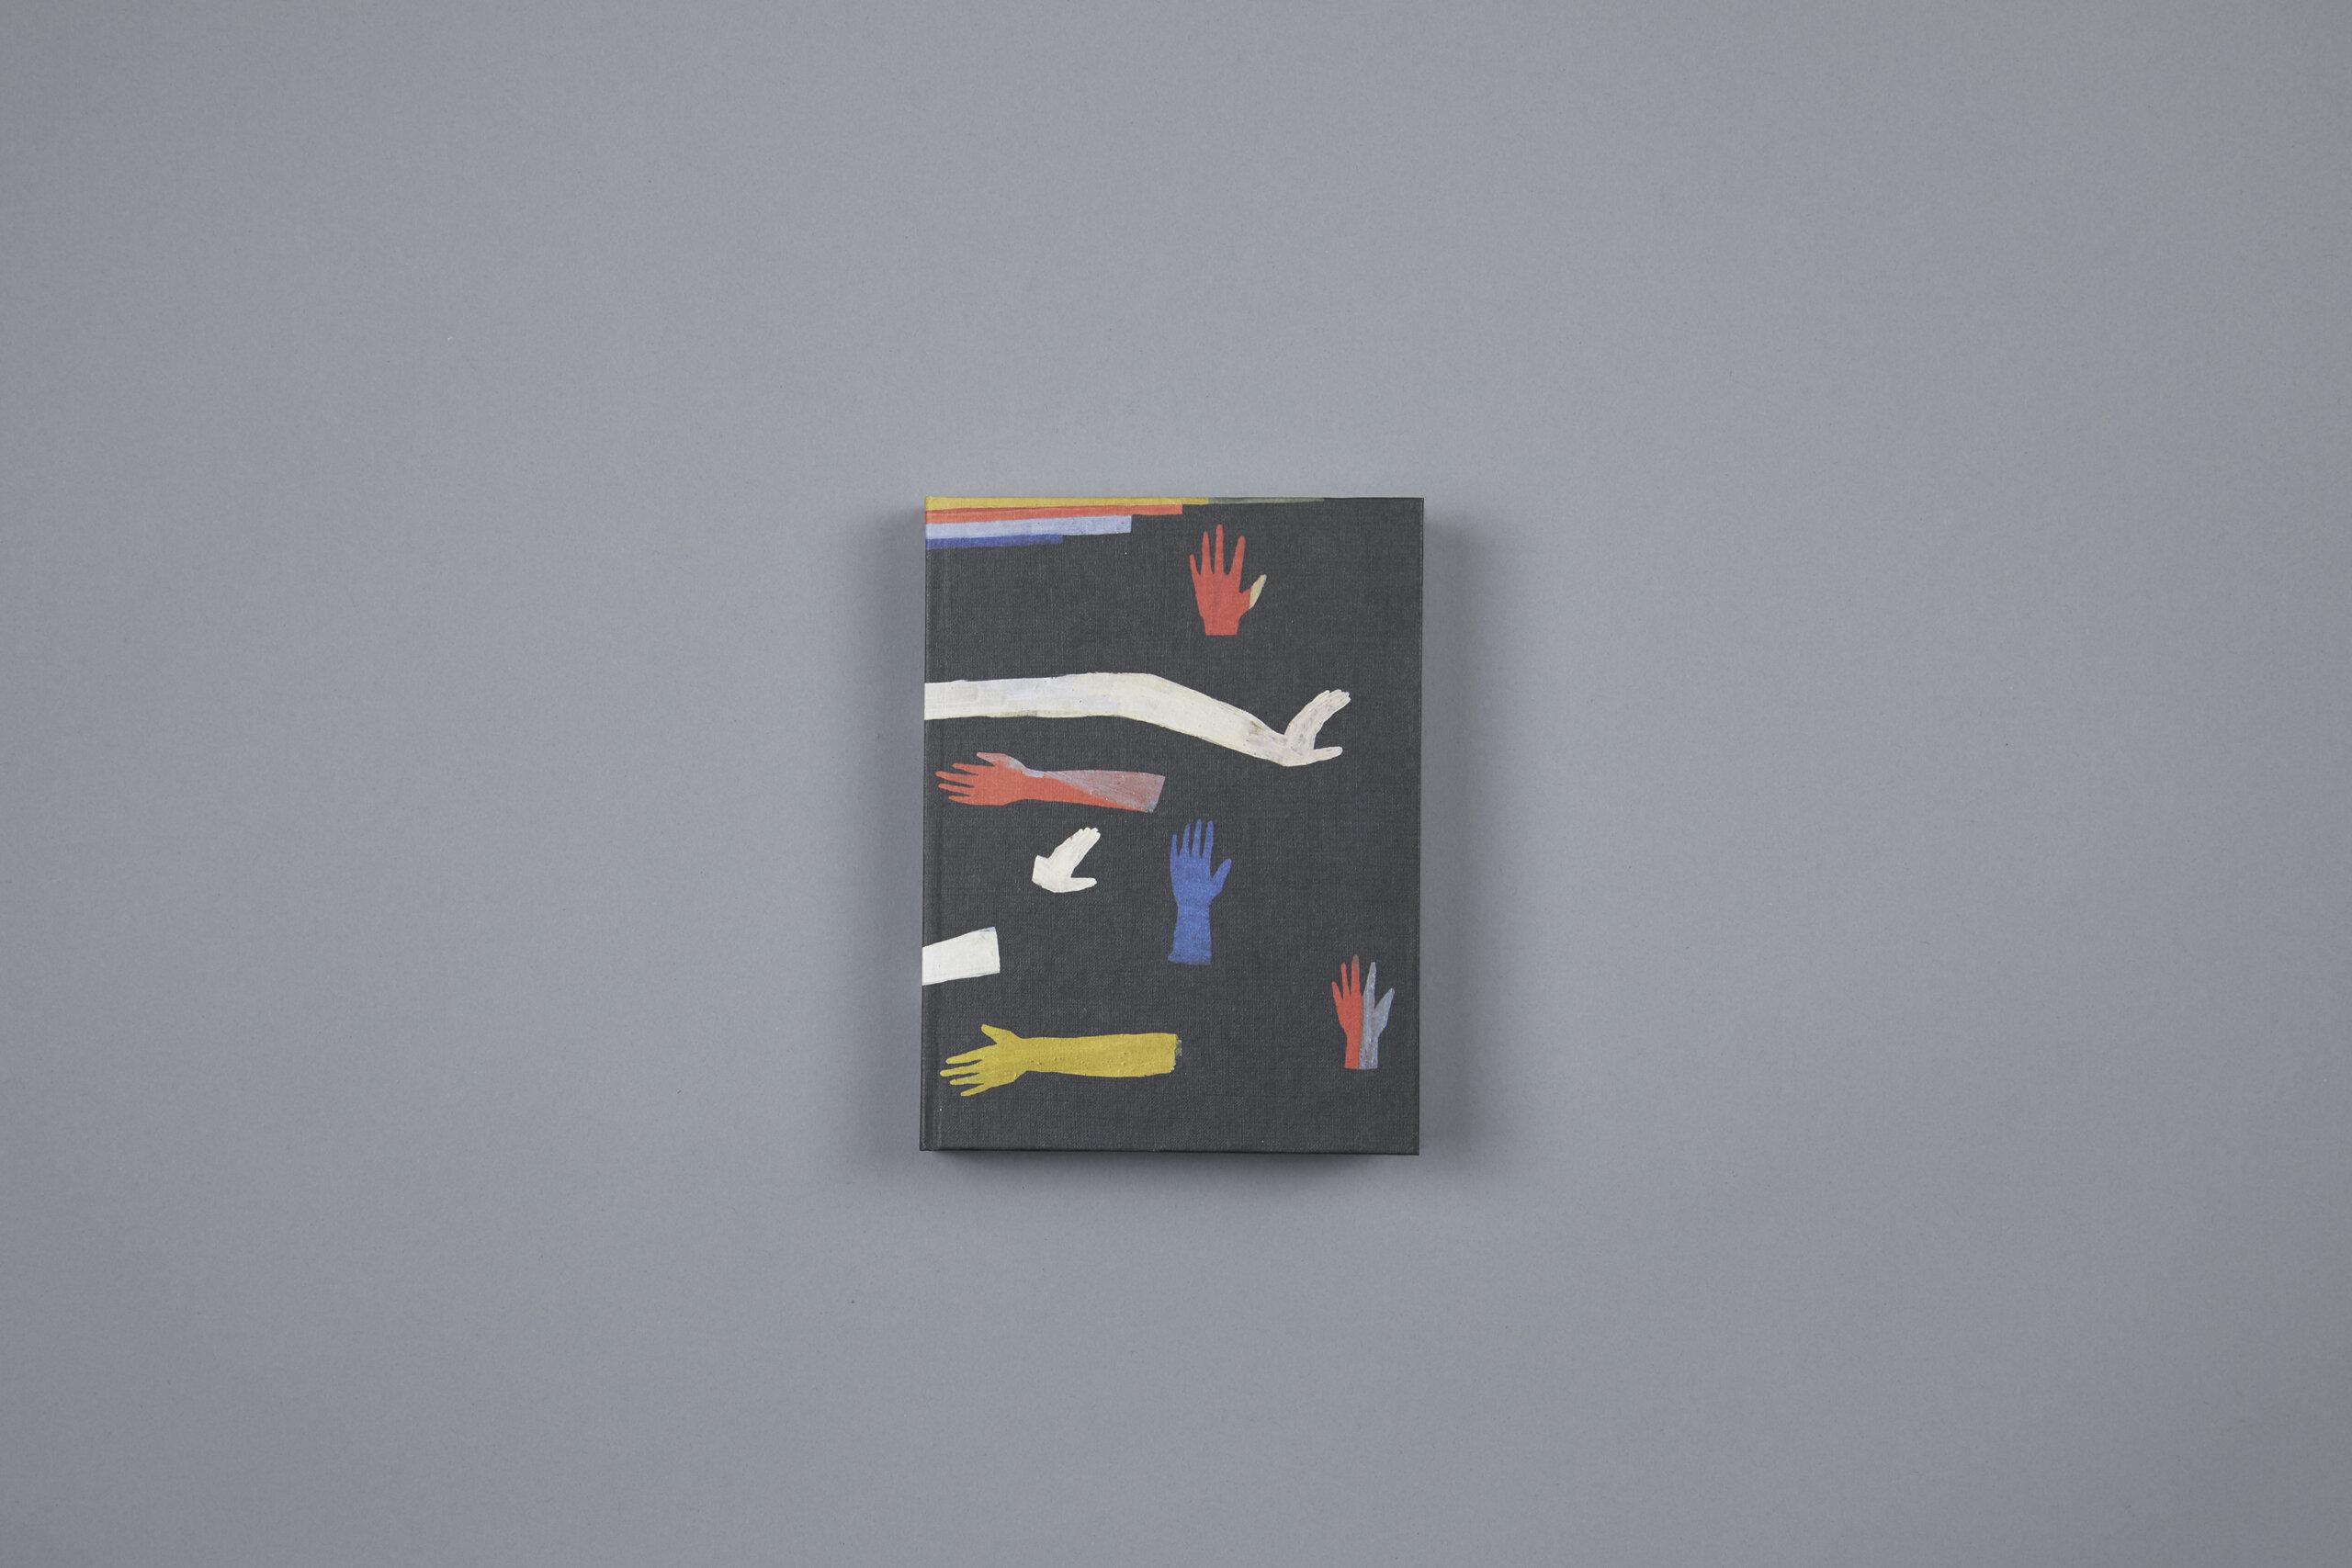 poimboeuf-koizumi-ellcock-jeux-mains-delpire-co